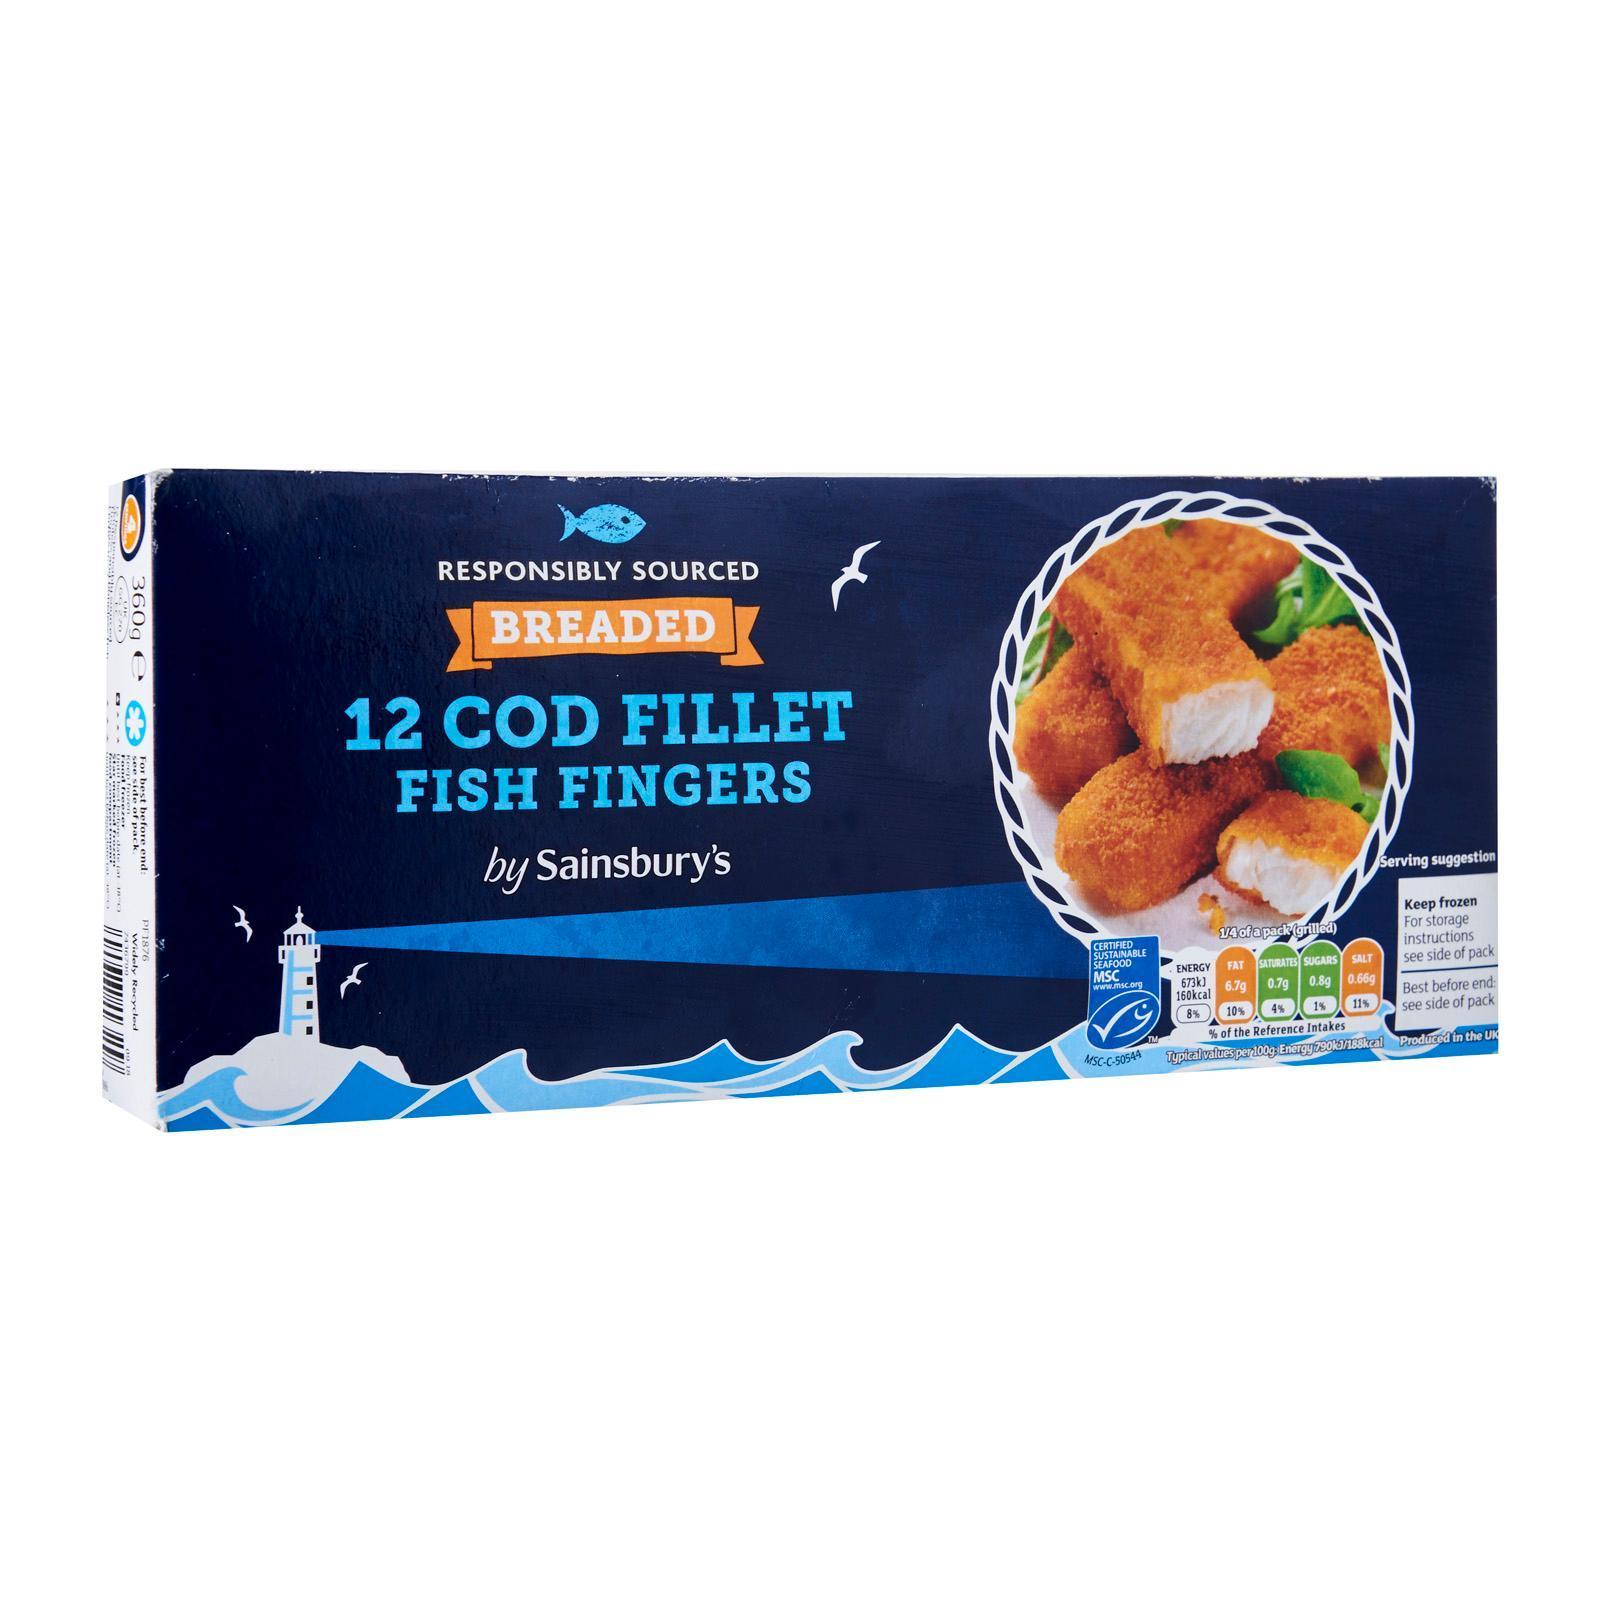 Sainsbury's Breaded Cod Fish Fingers - Frozen